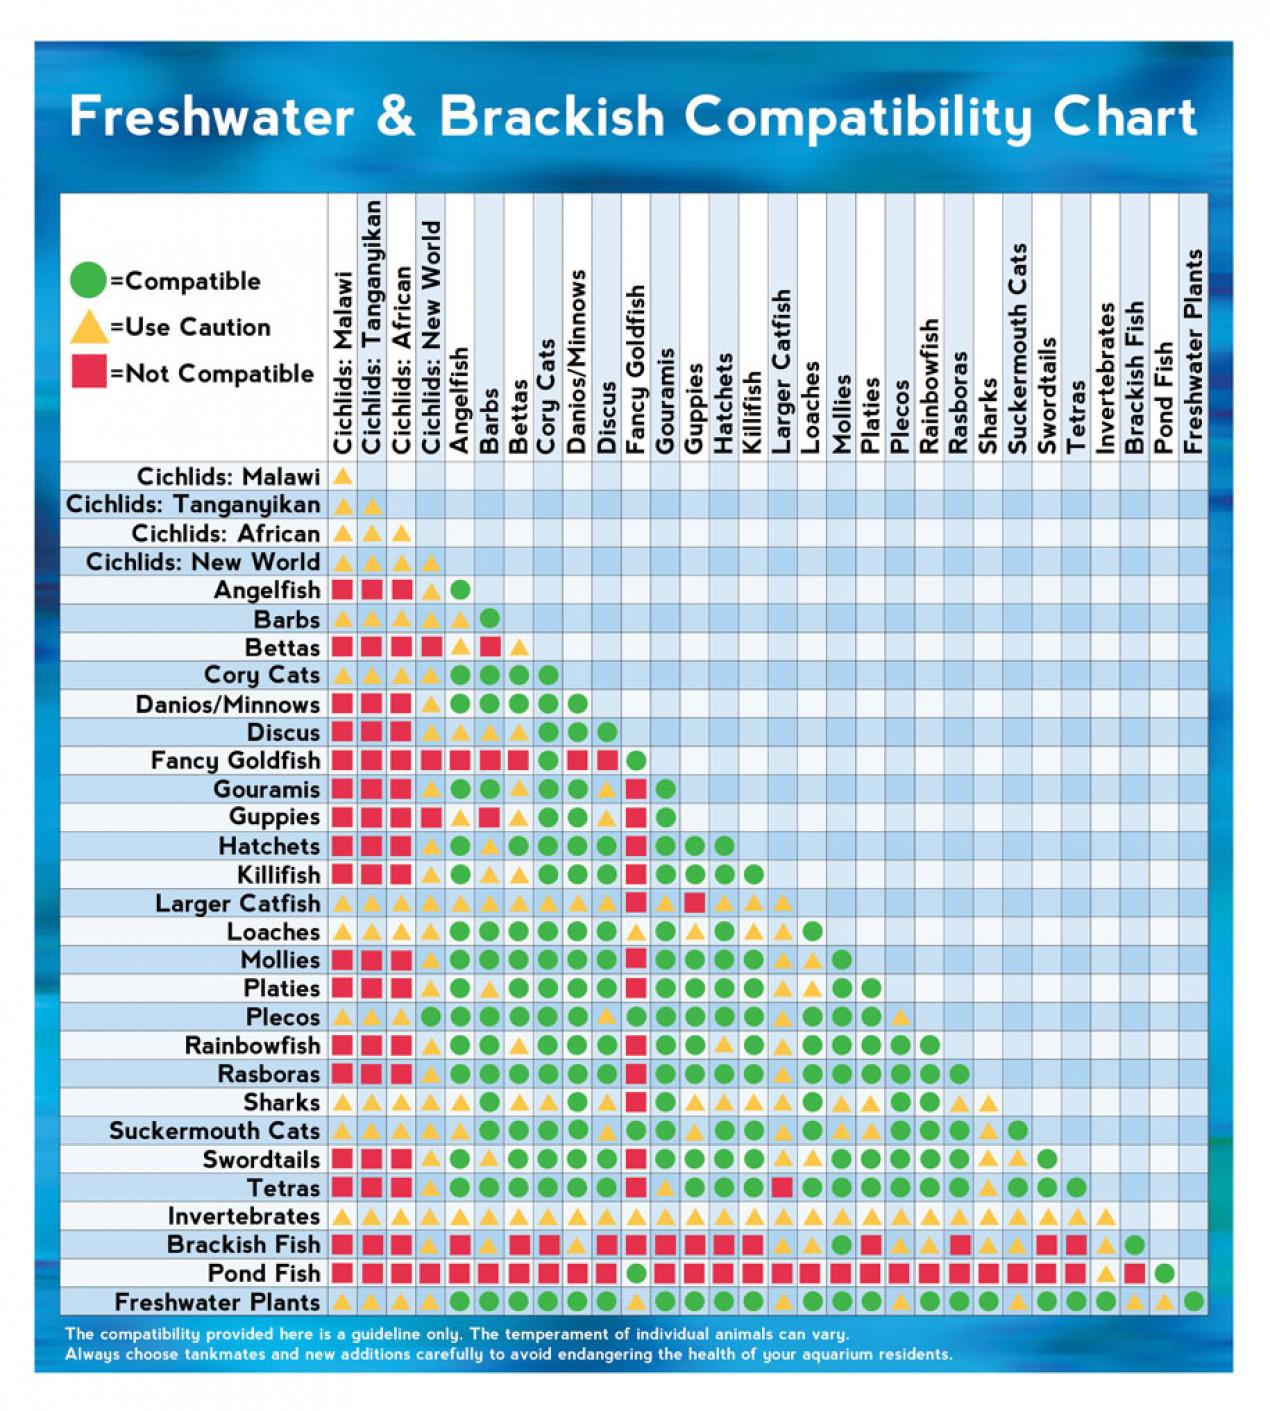 Freshwater & Brackish Fish Compatibility Chart